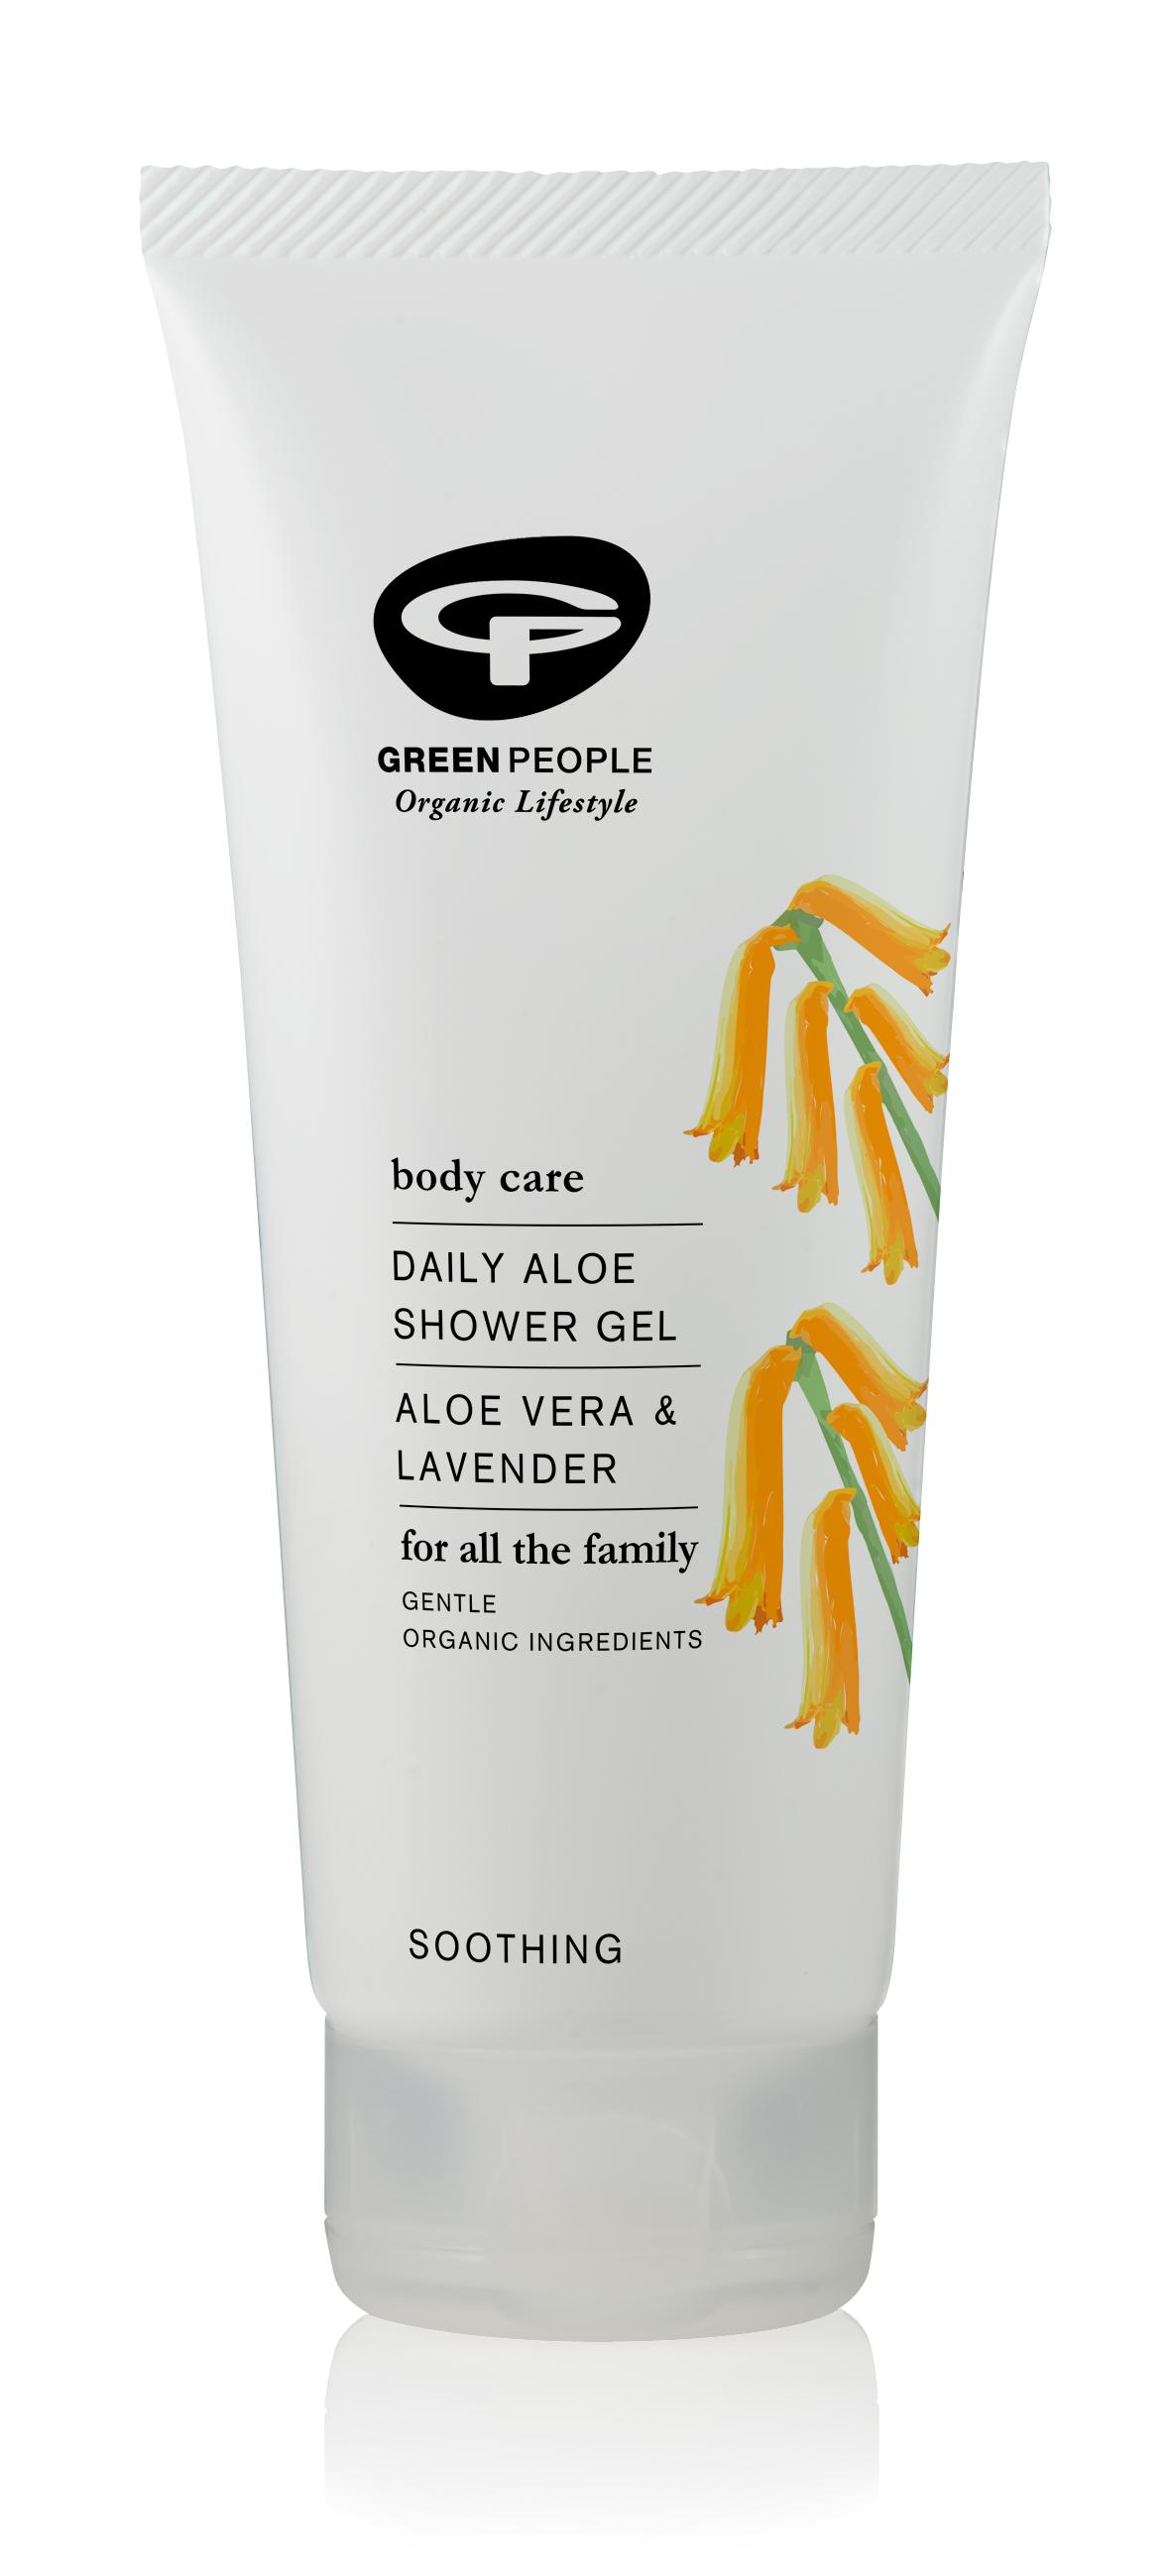 Daily Aloe Shower Gel 200ml